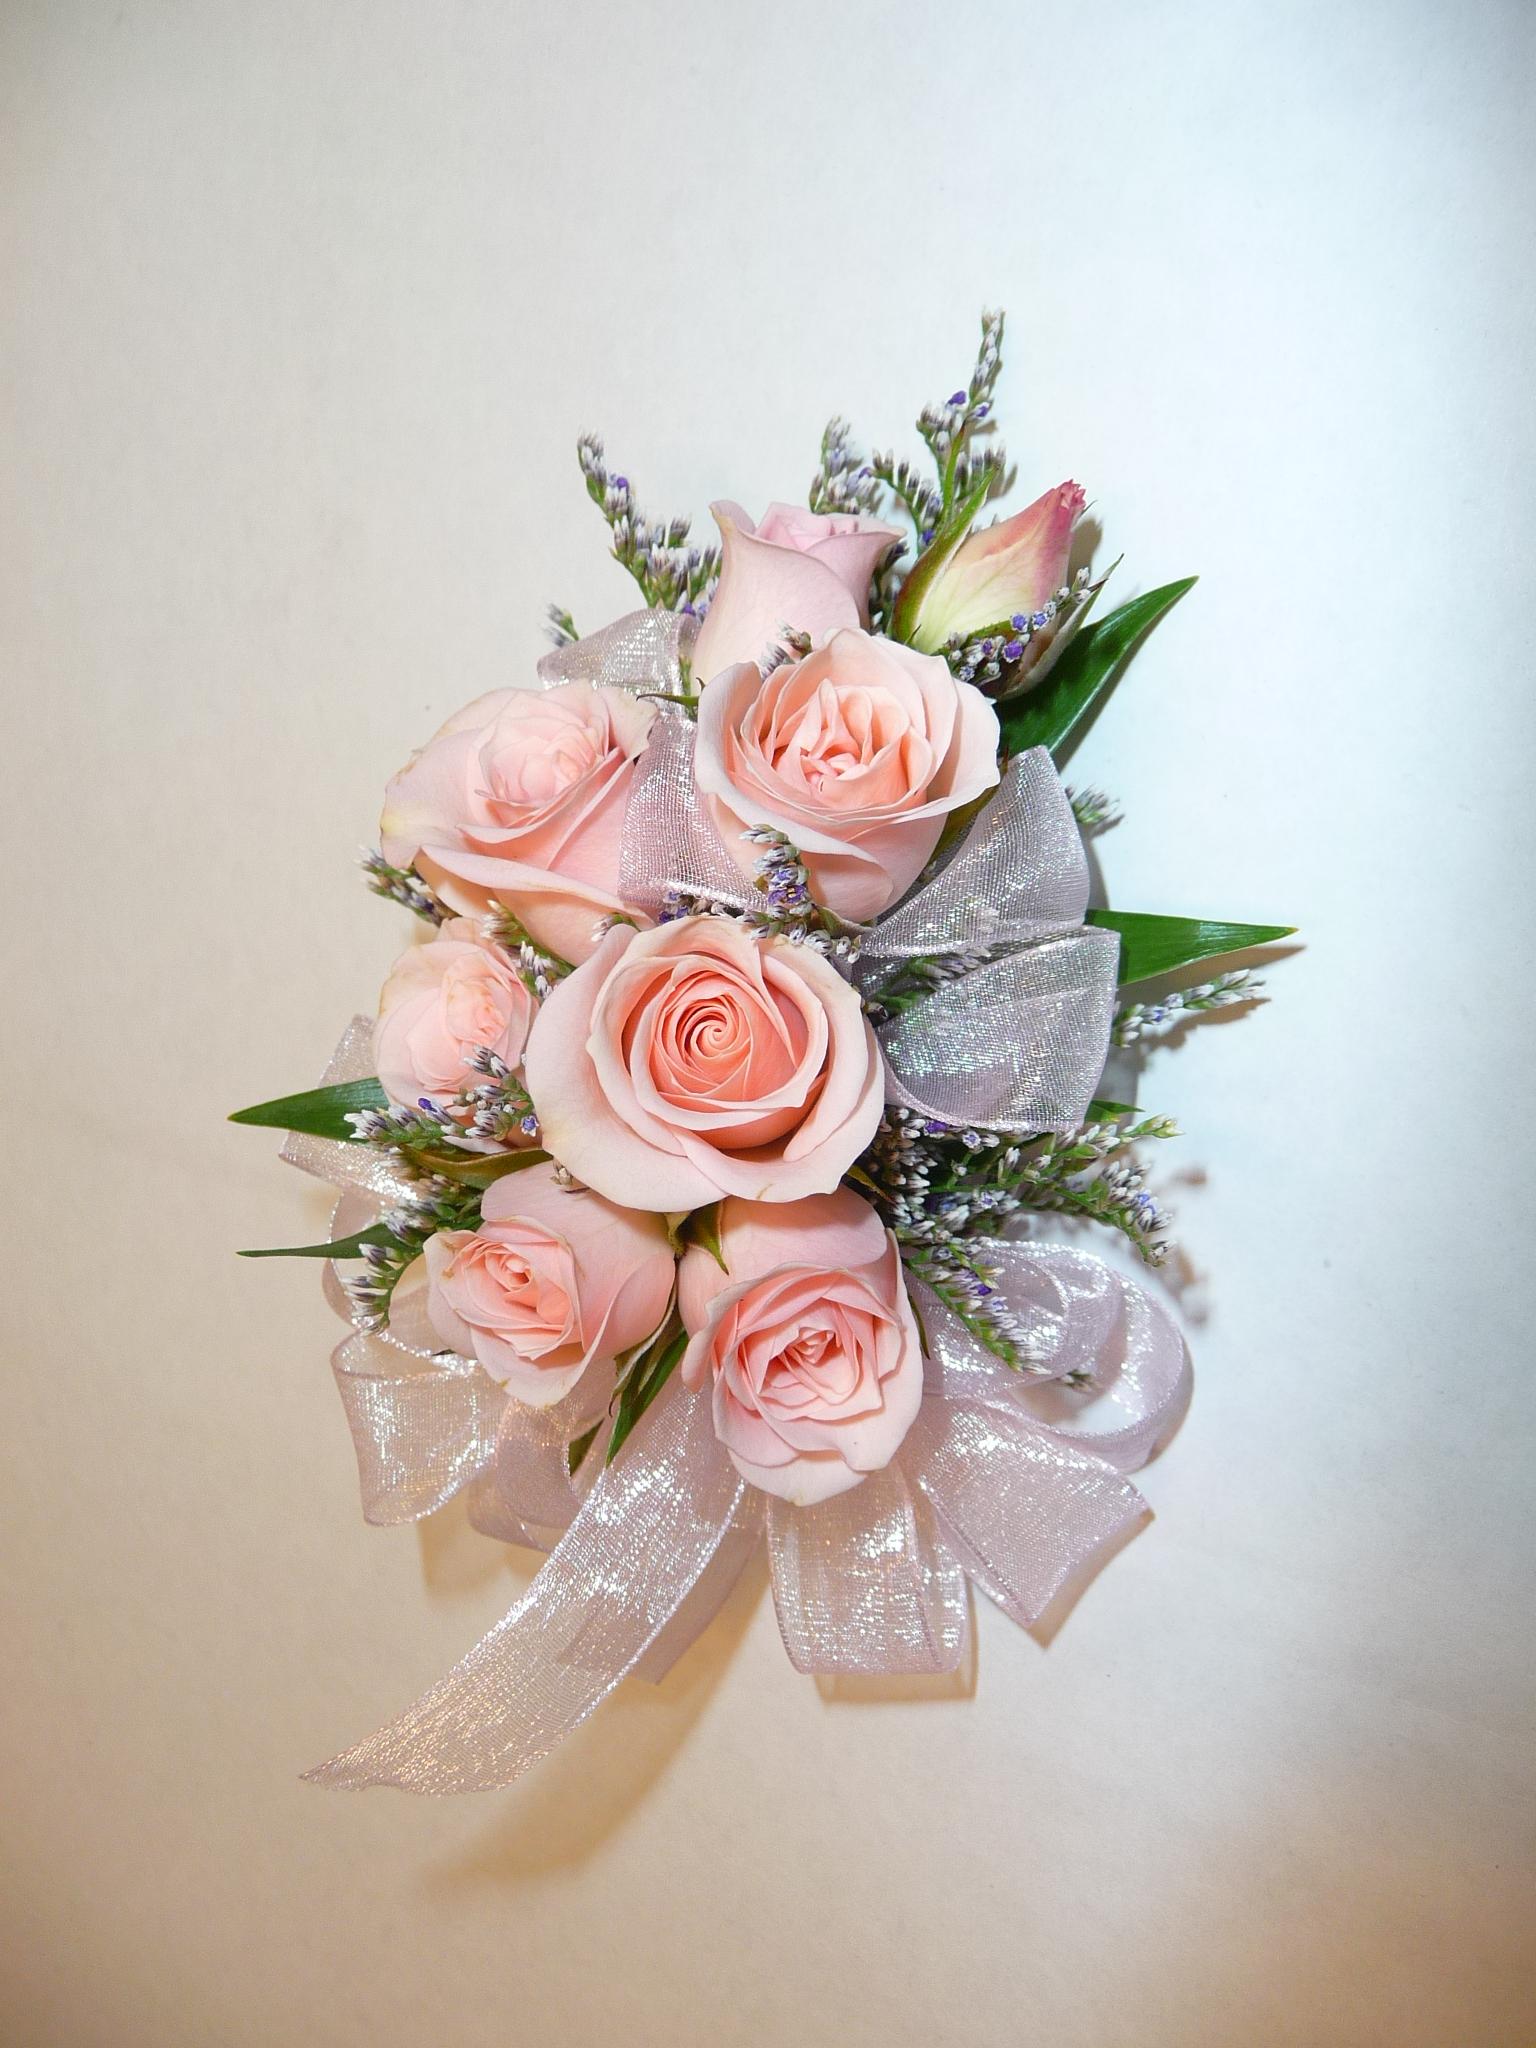 Sweet Roses Wrist Corsage